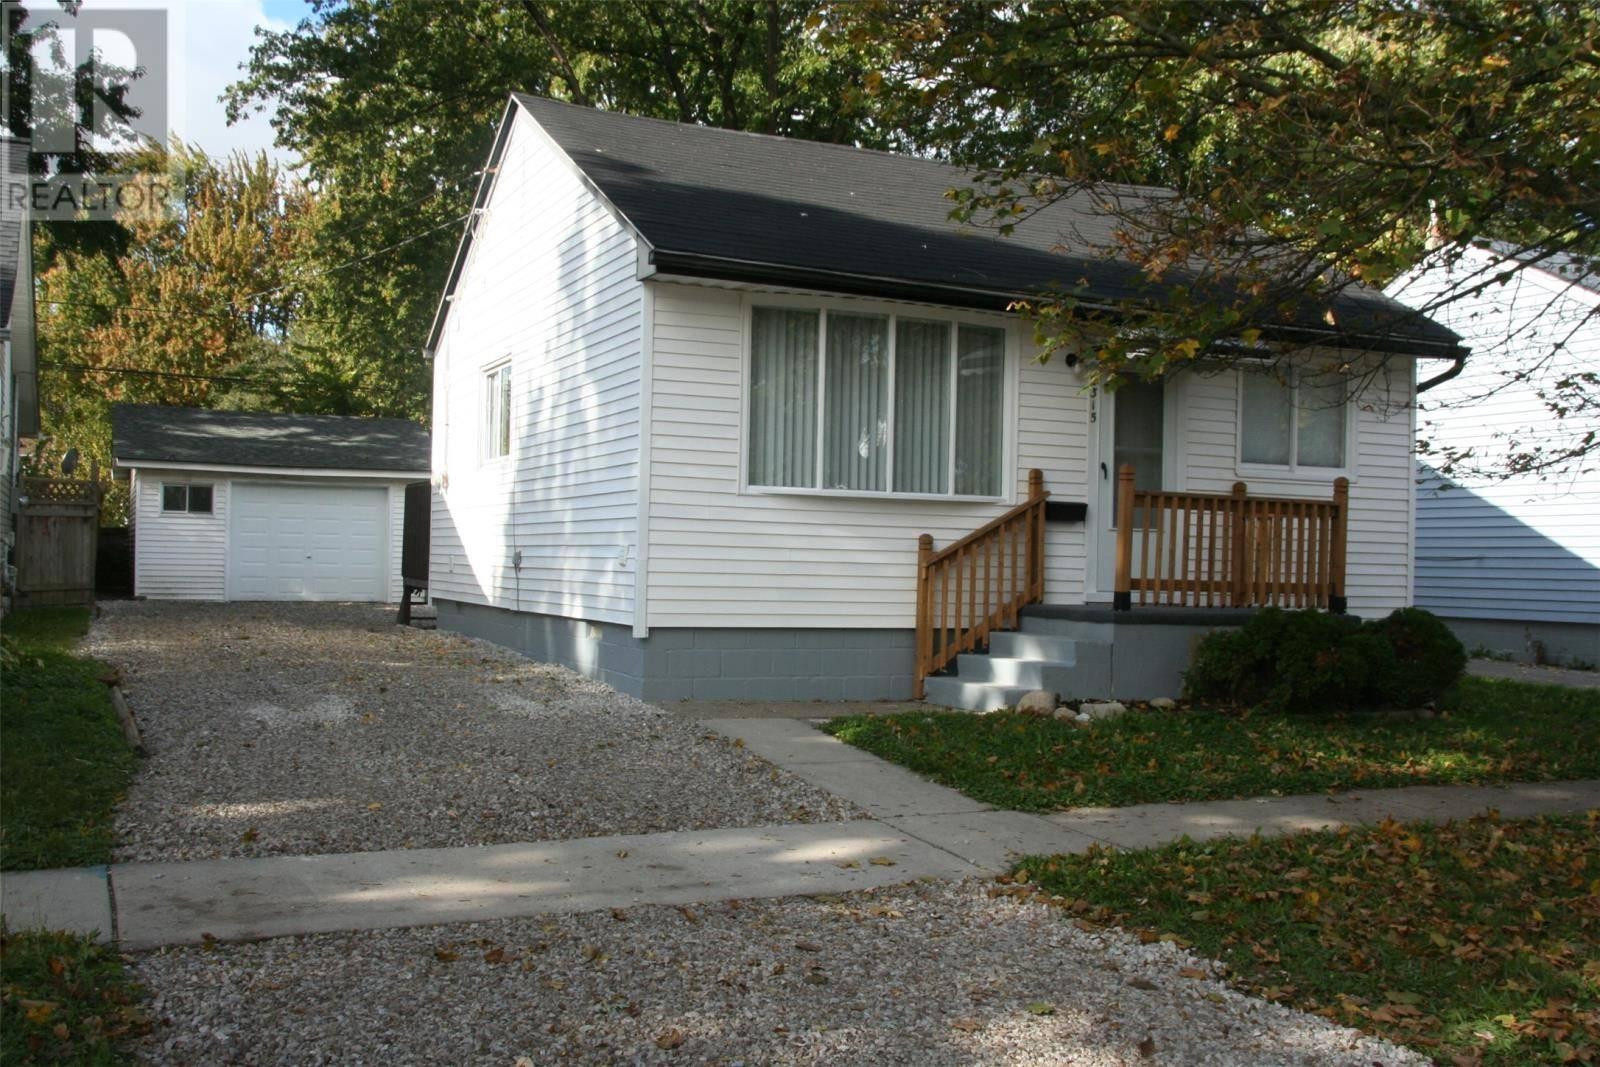 House for sale at 2315 Wellesley  Windsor Ontario - MLS: 19027342